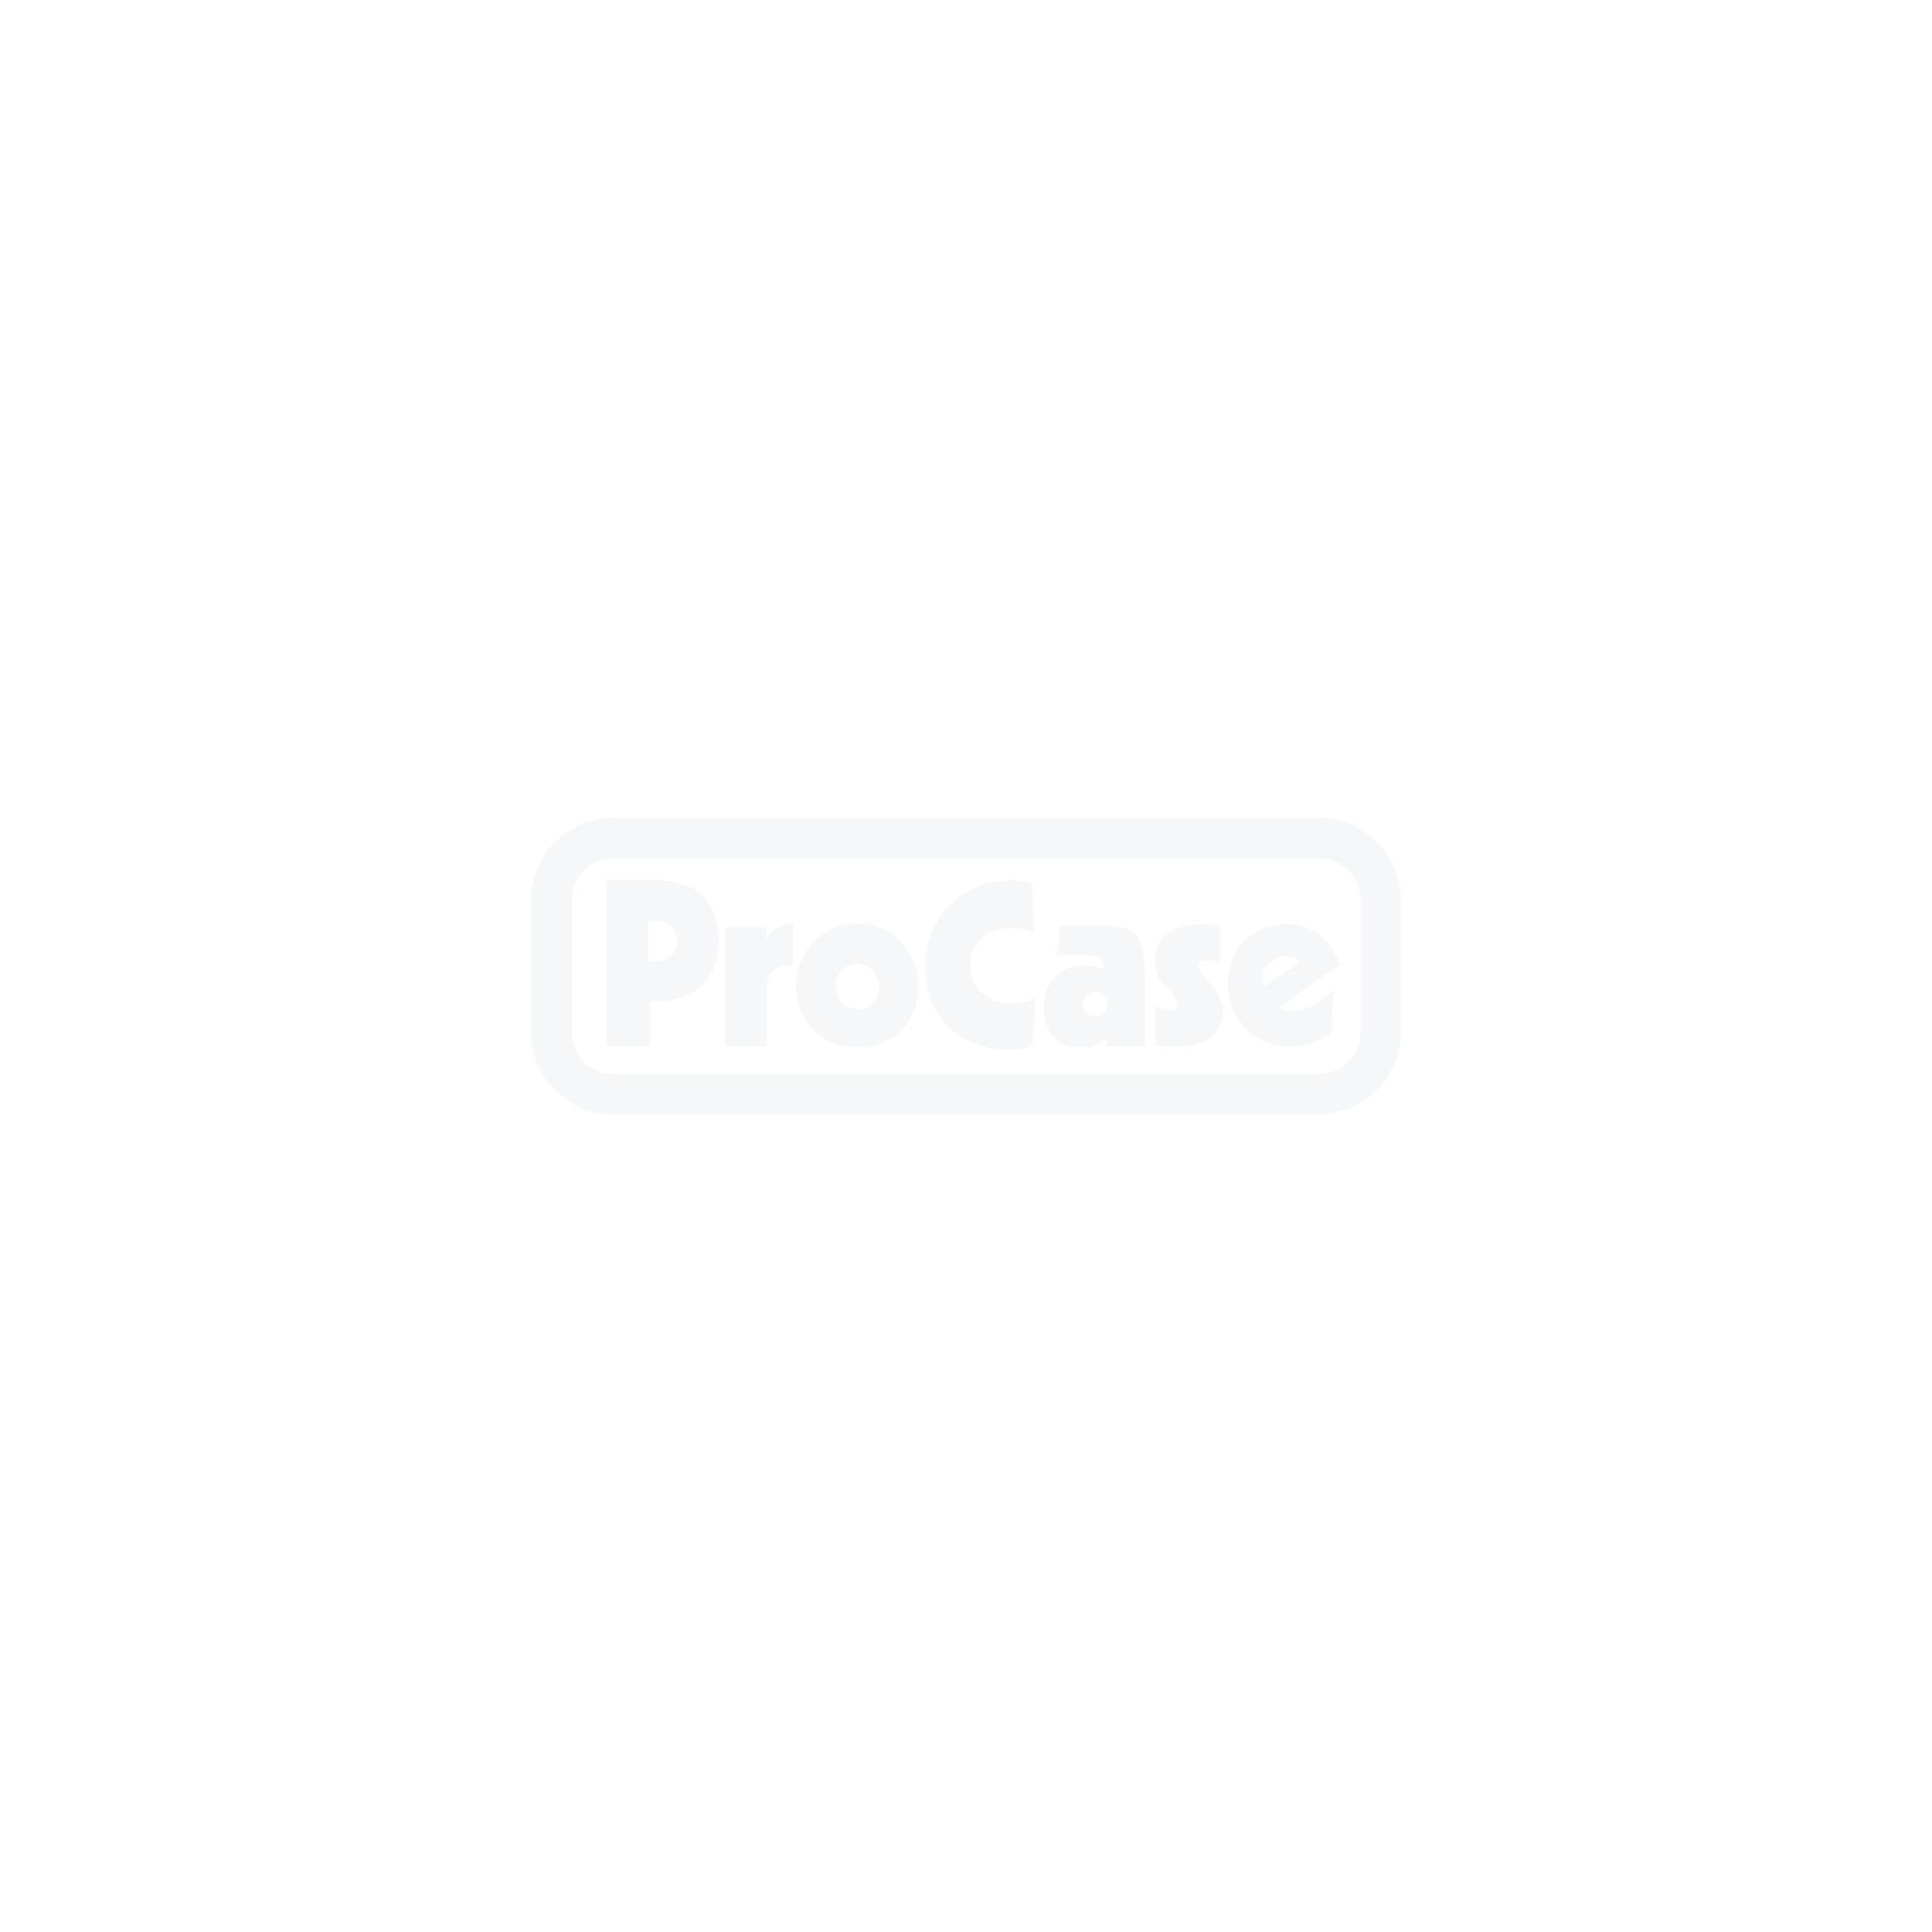 Transportbox variabel für Ultraschallgerät 3